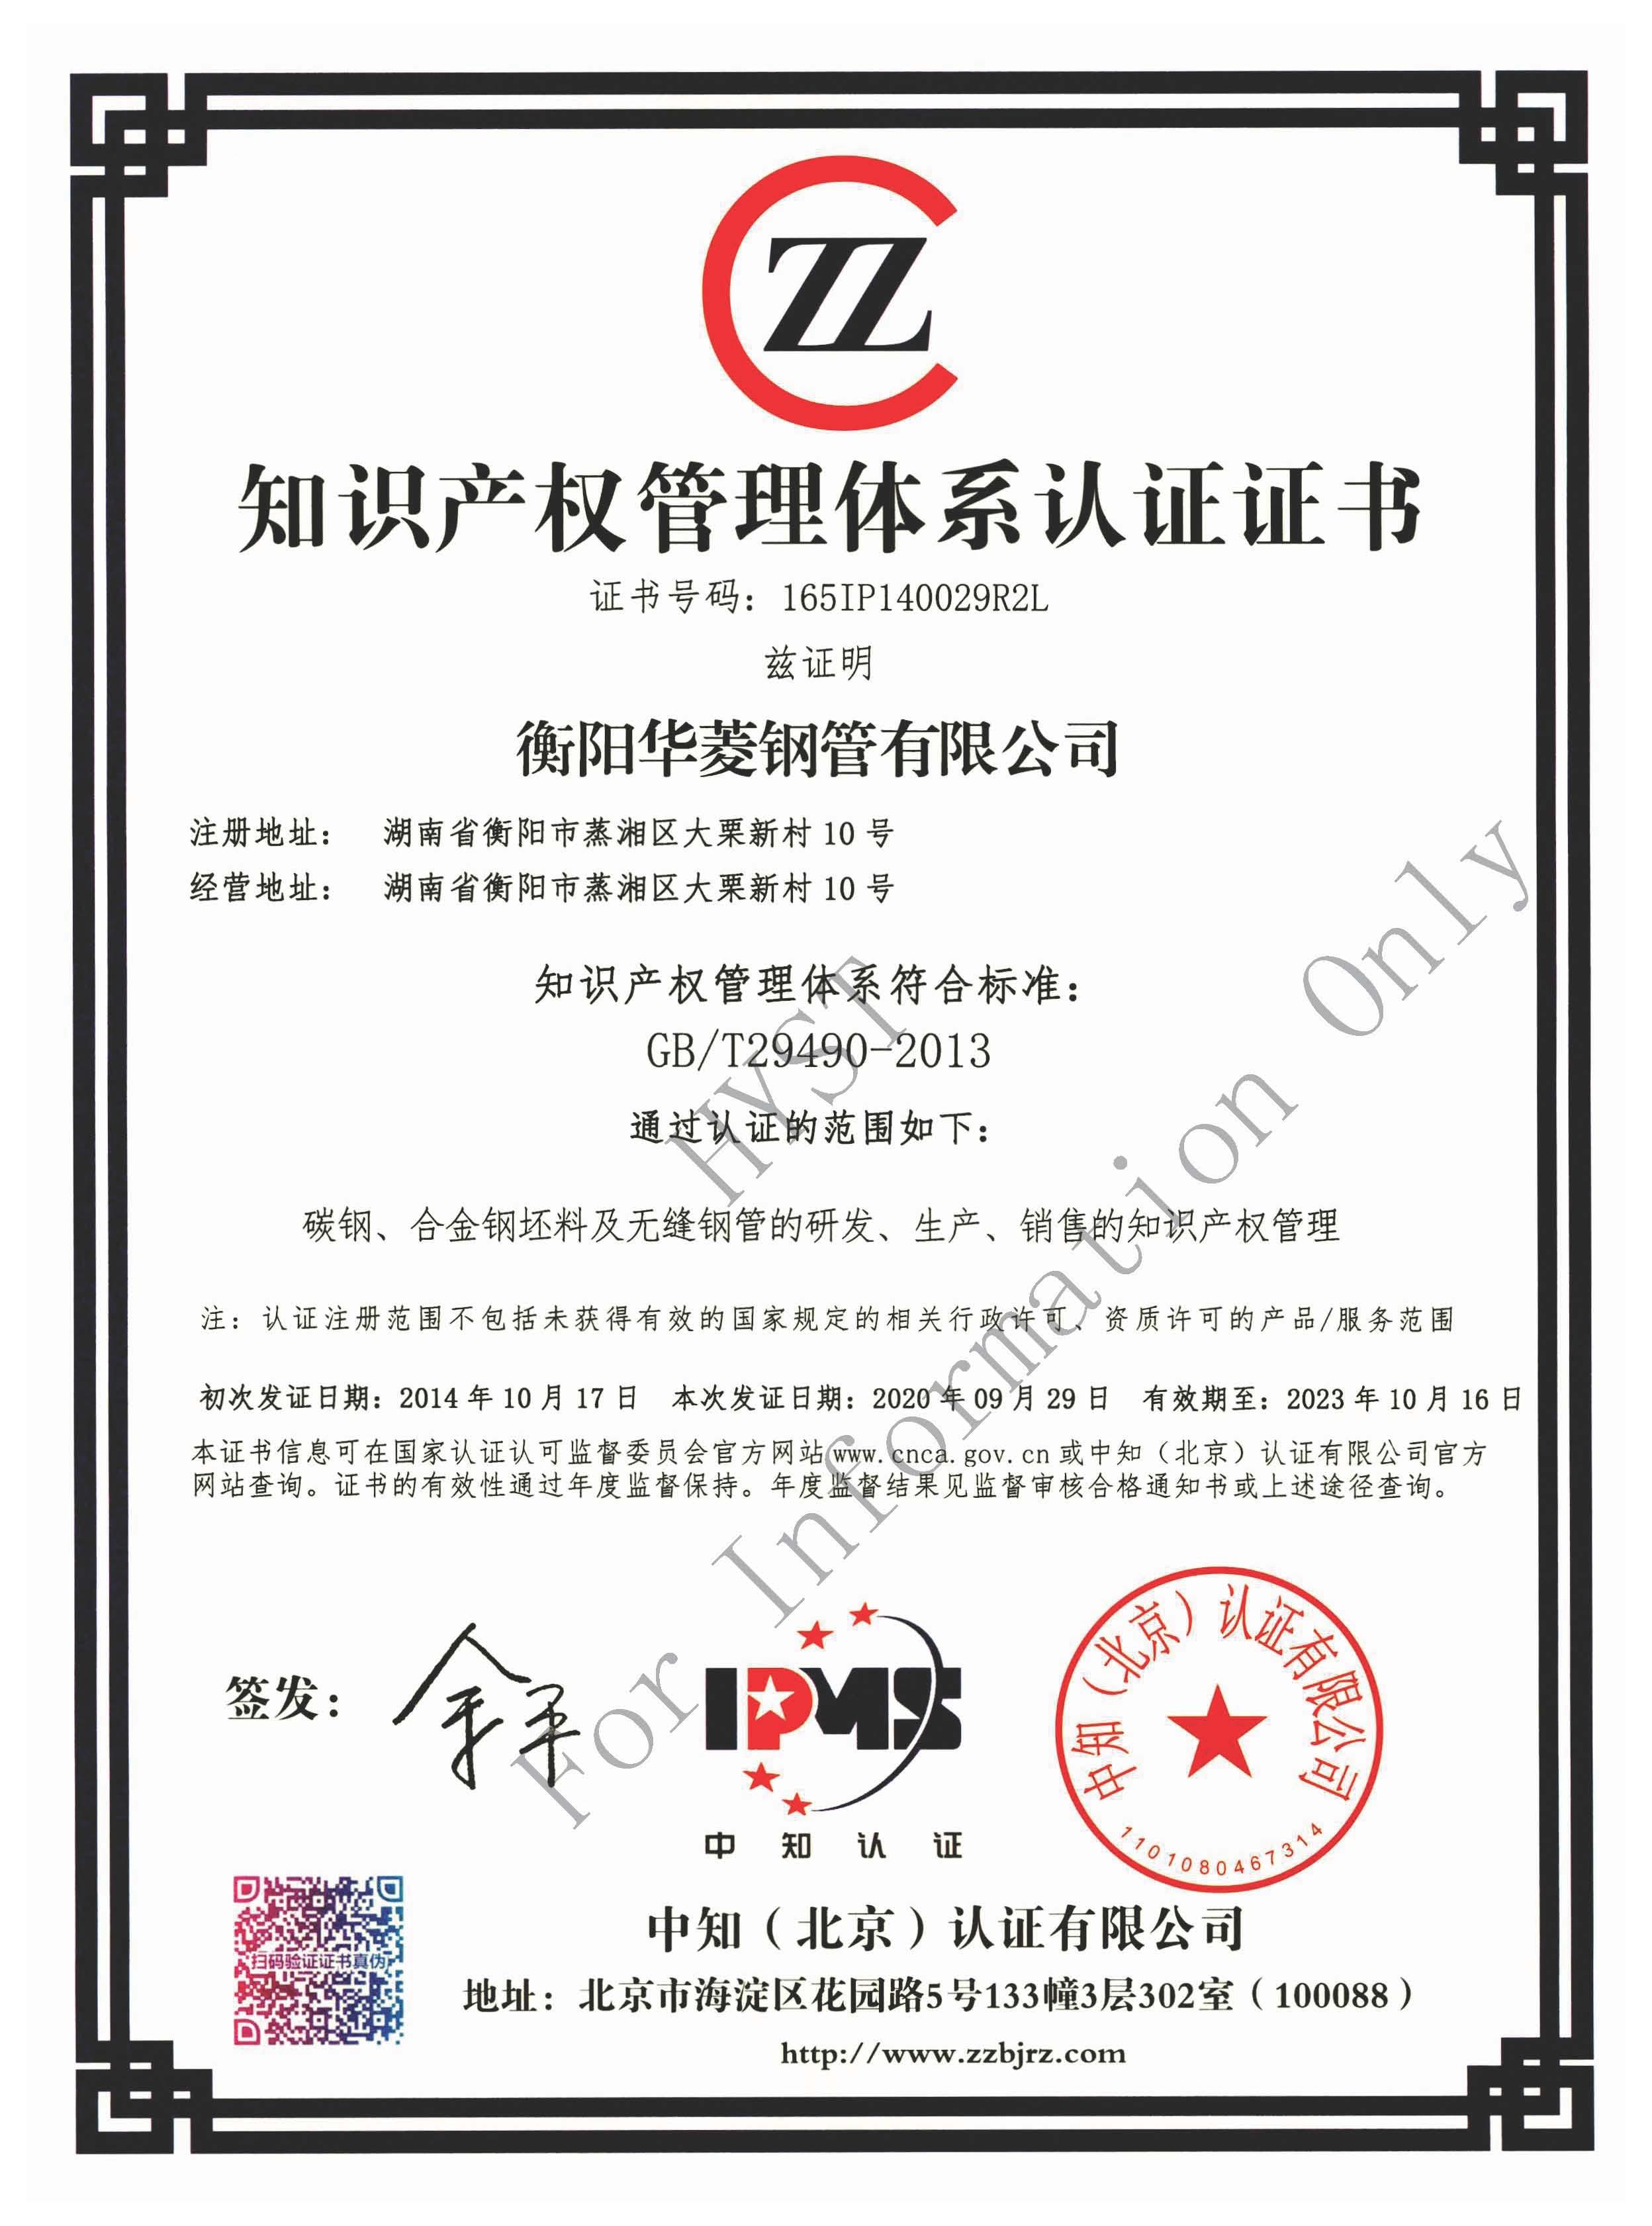 Intellectual Property Certificate